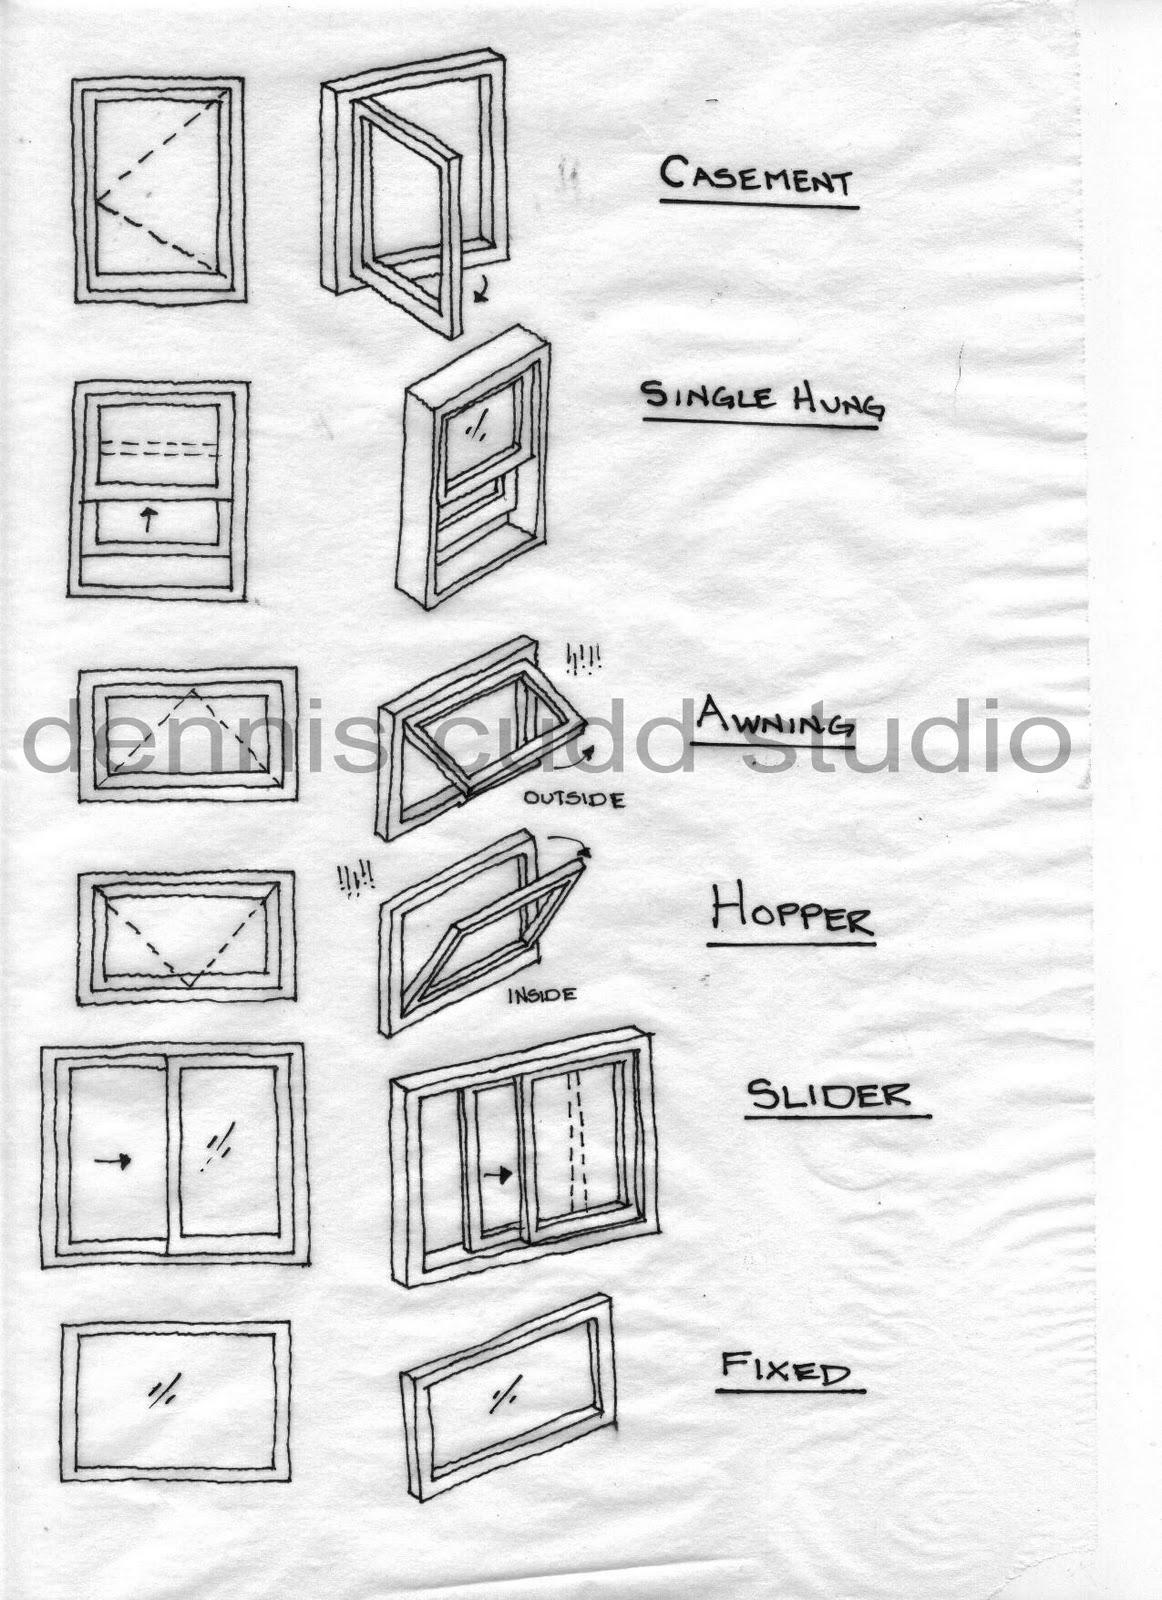 Dennis cudd studios window types for Types of windows